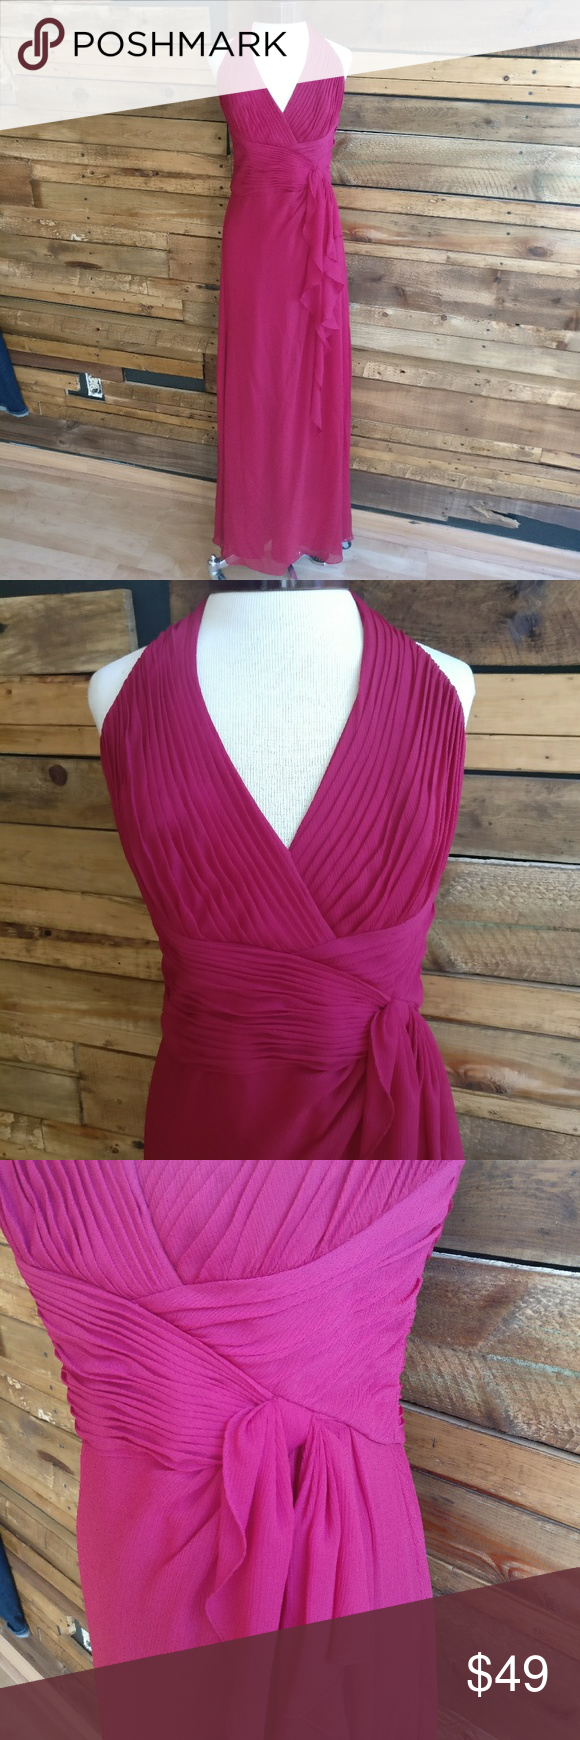 David\'s Bridal Soft Crinkle Chiffon Halter Dress